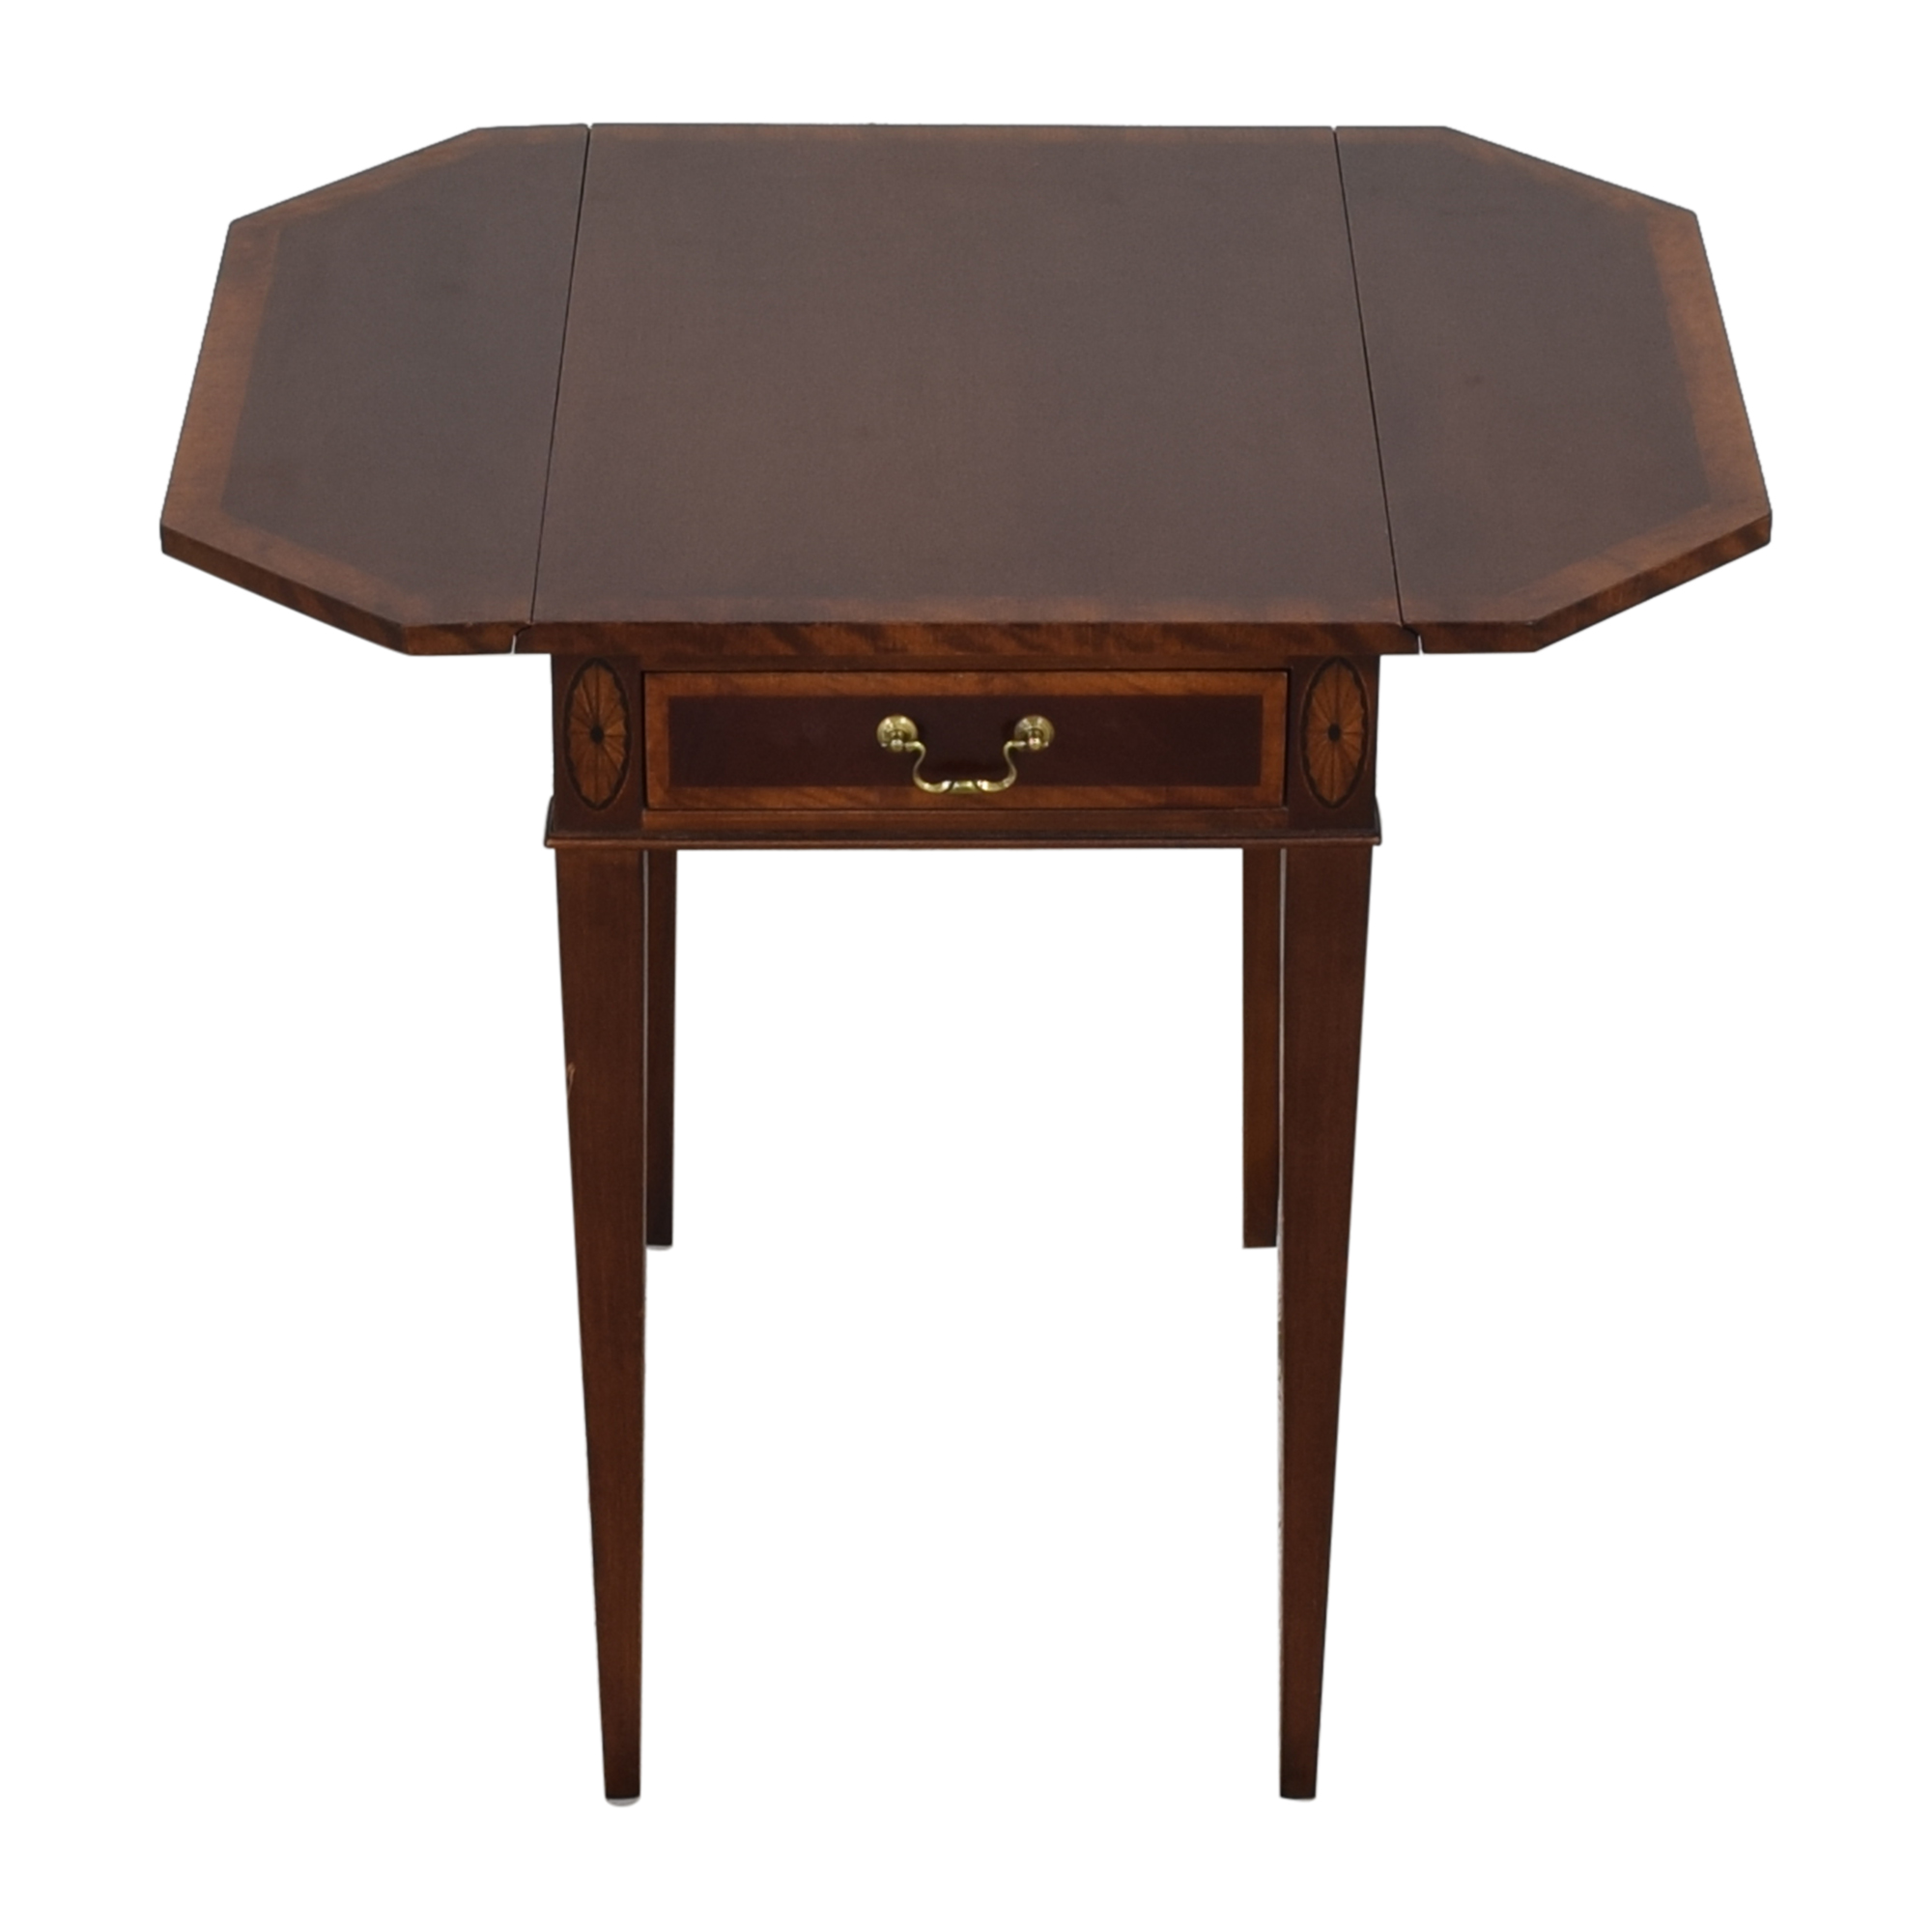 Henredon Drop Leaf Accent Table / Tables